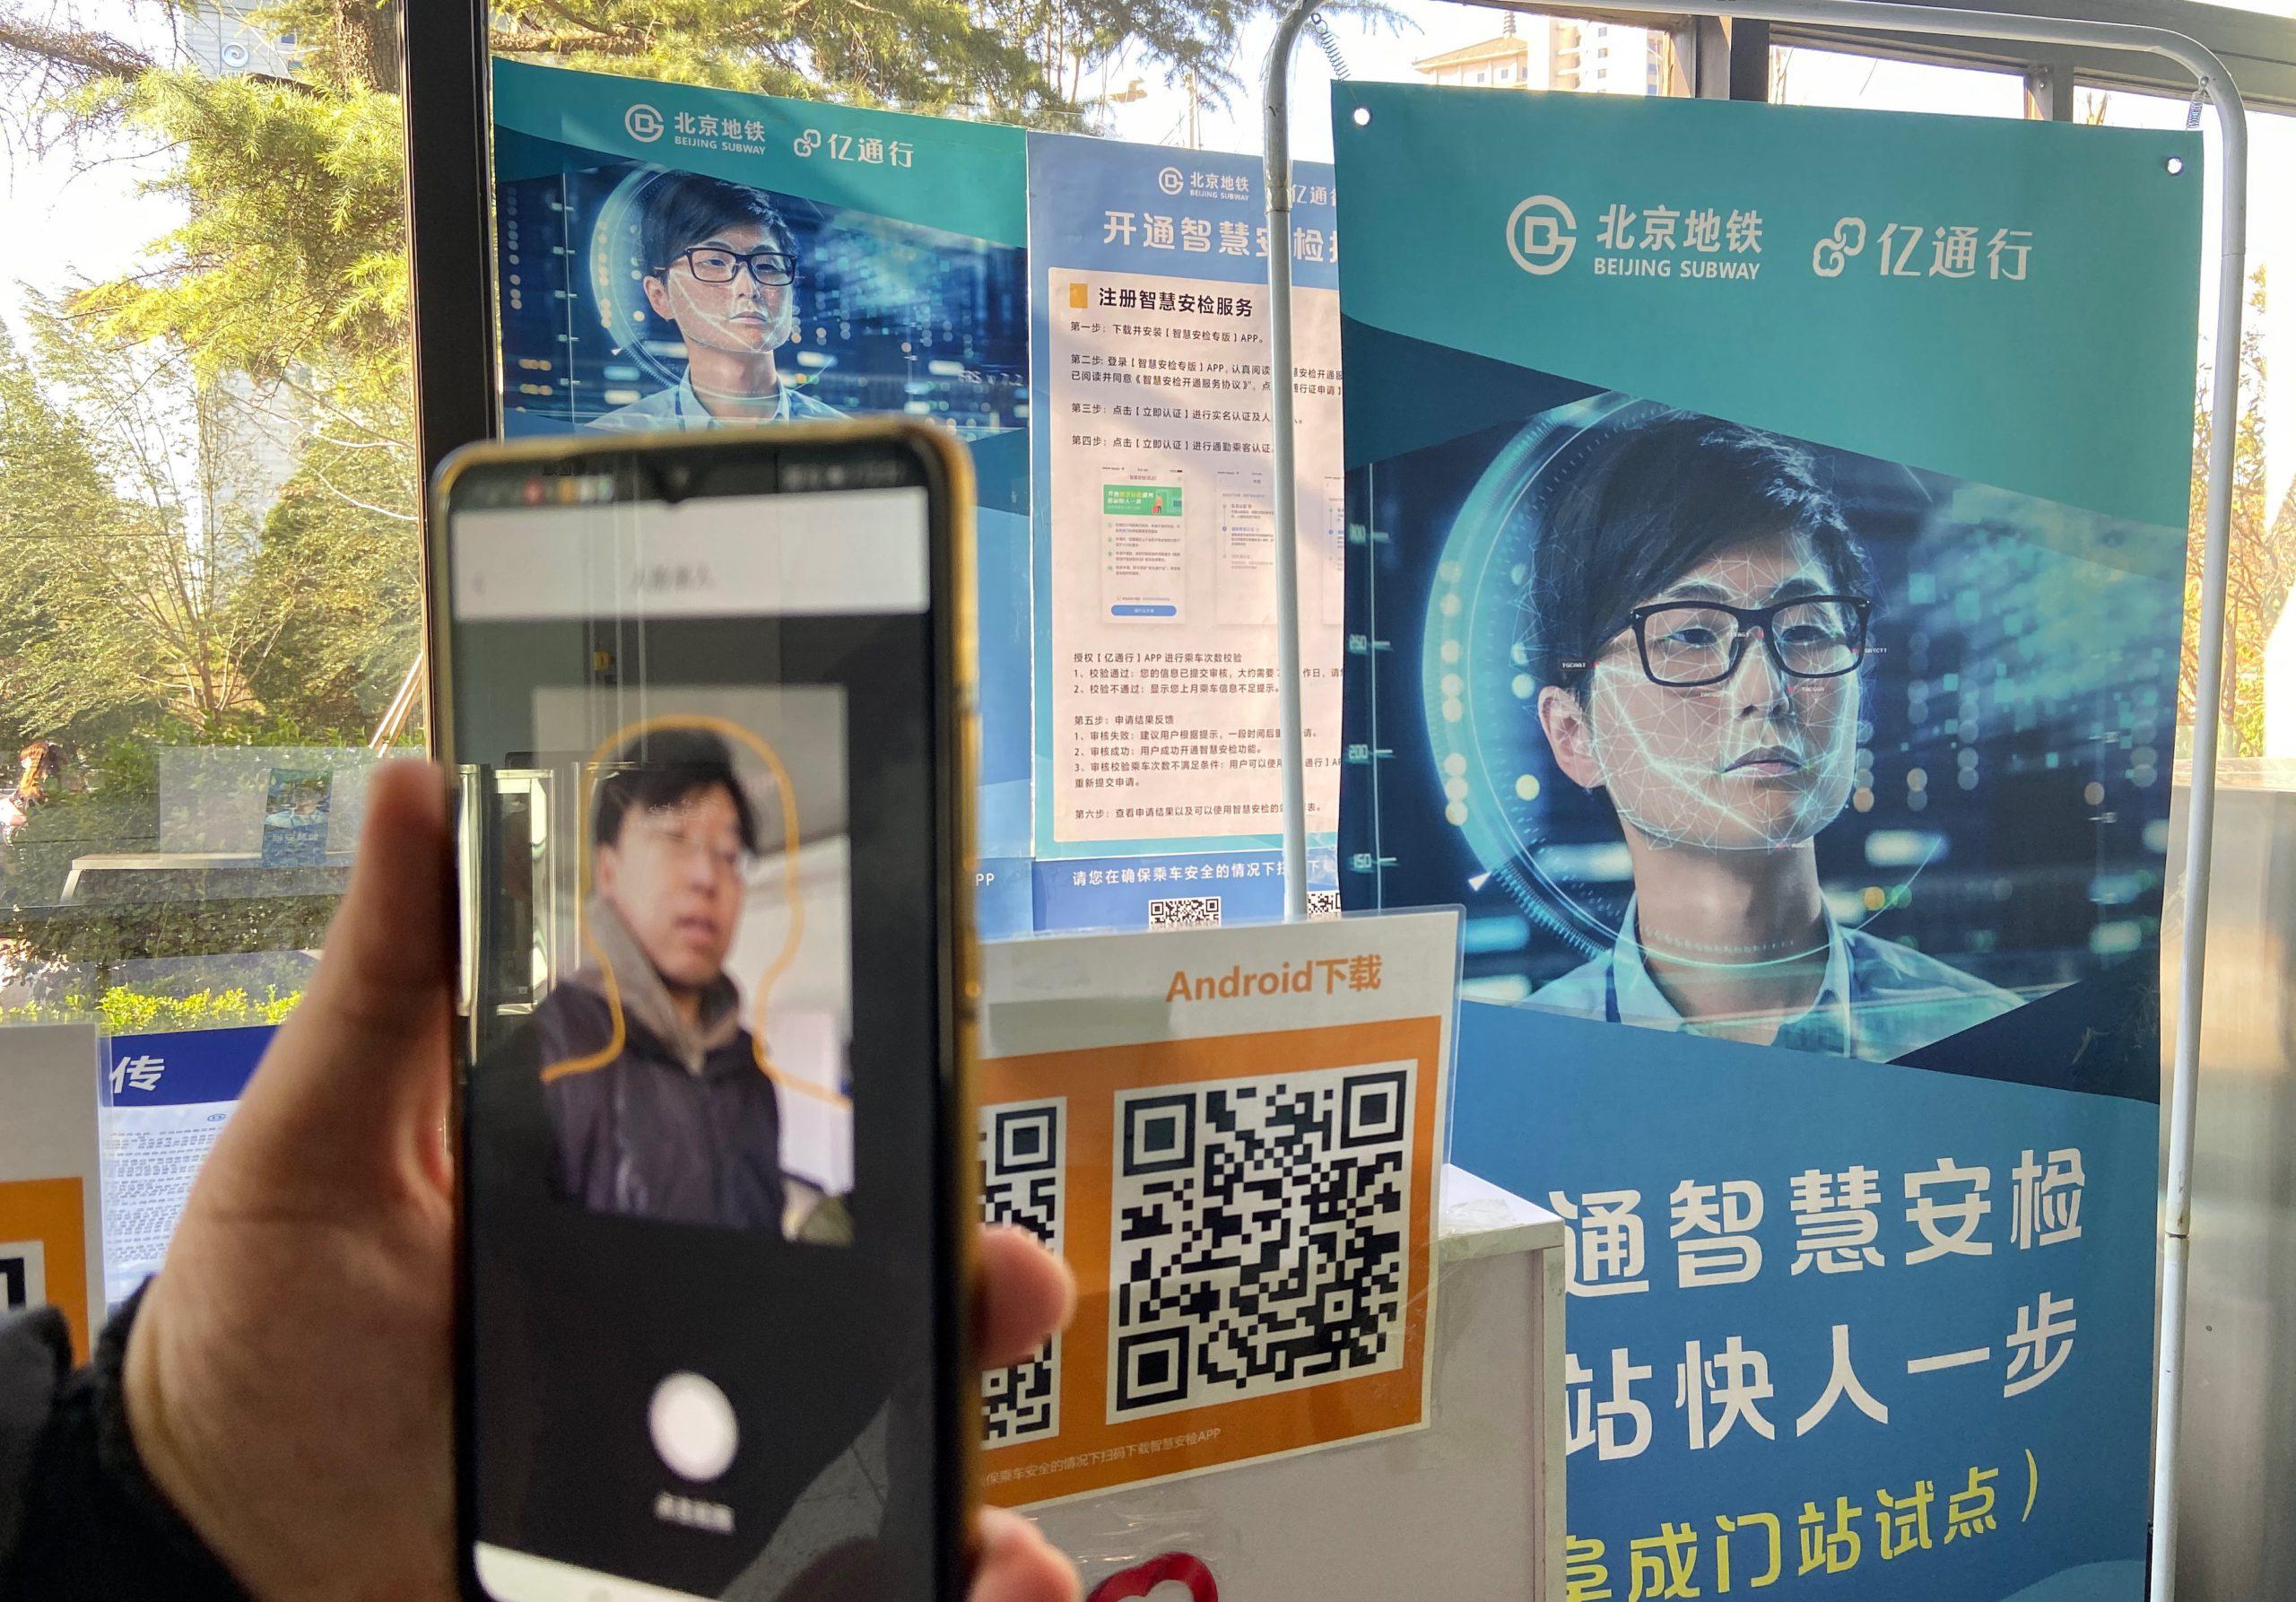 la Surveillance faciale dans le métro de Pékin